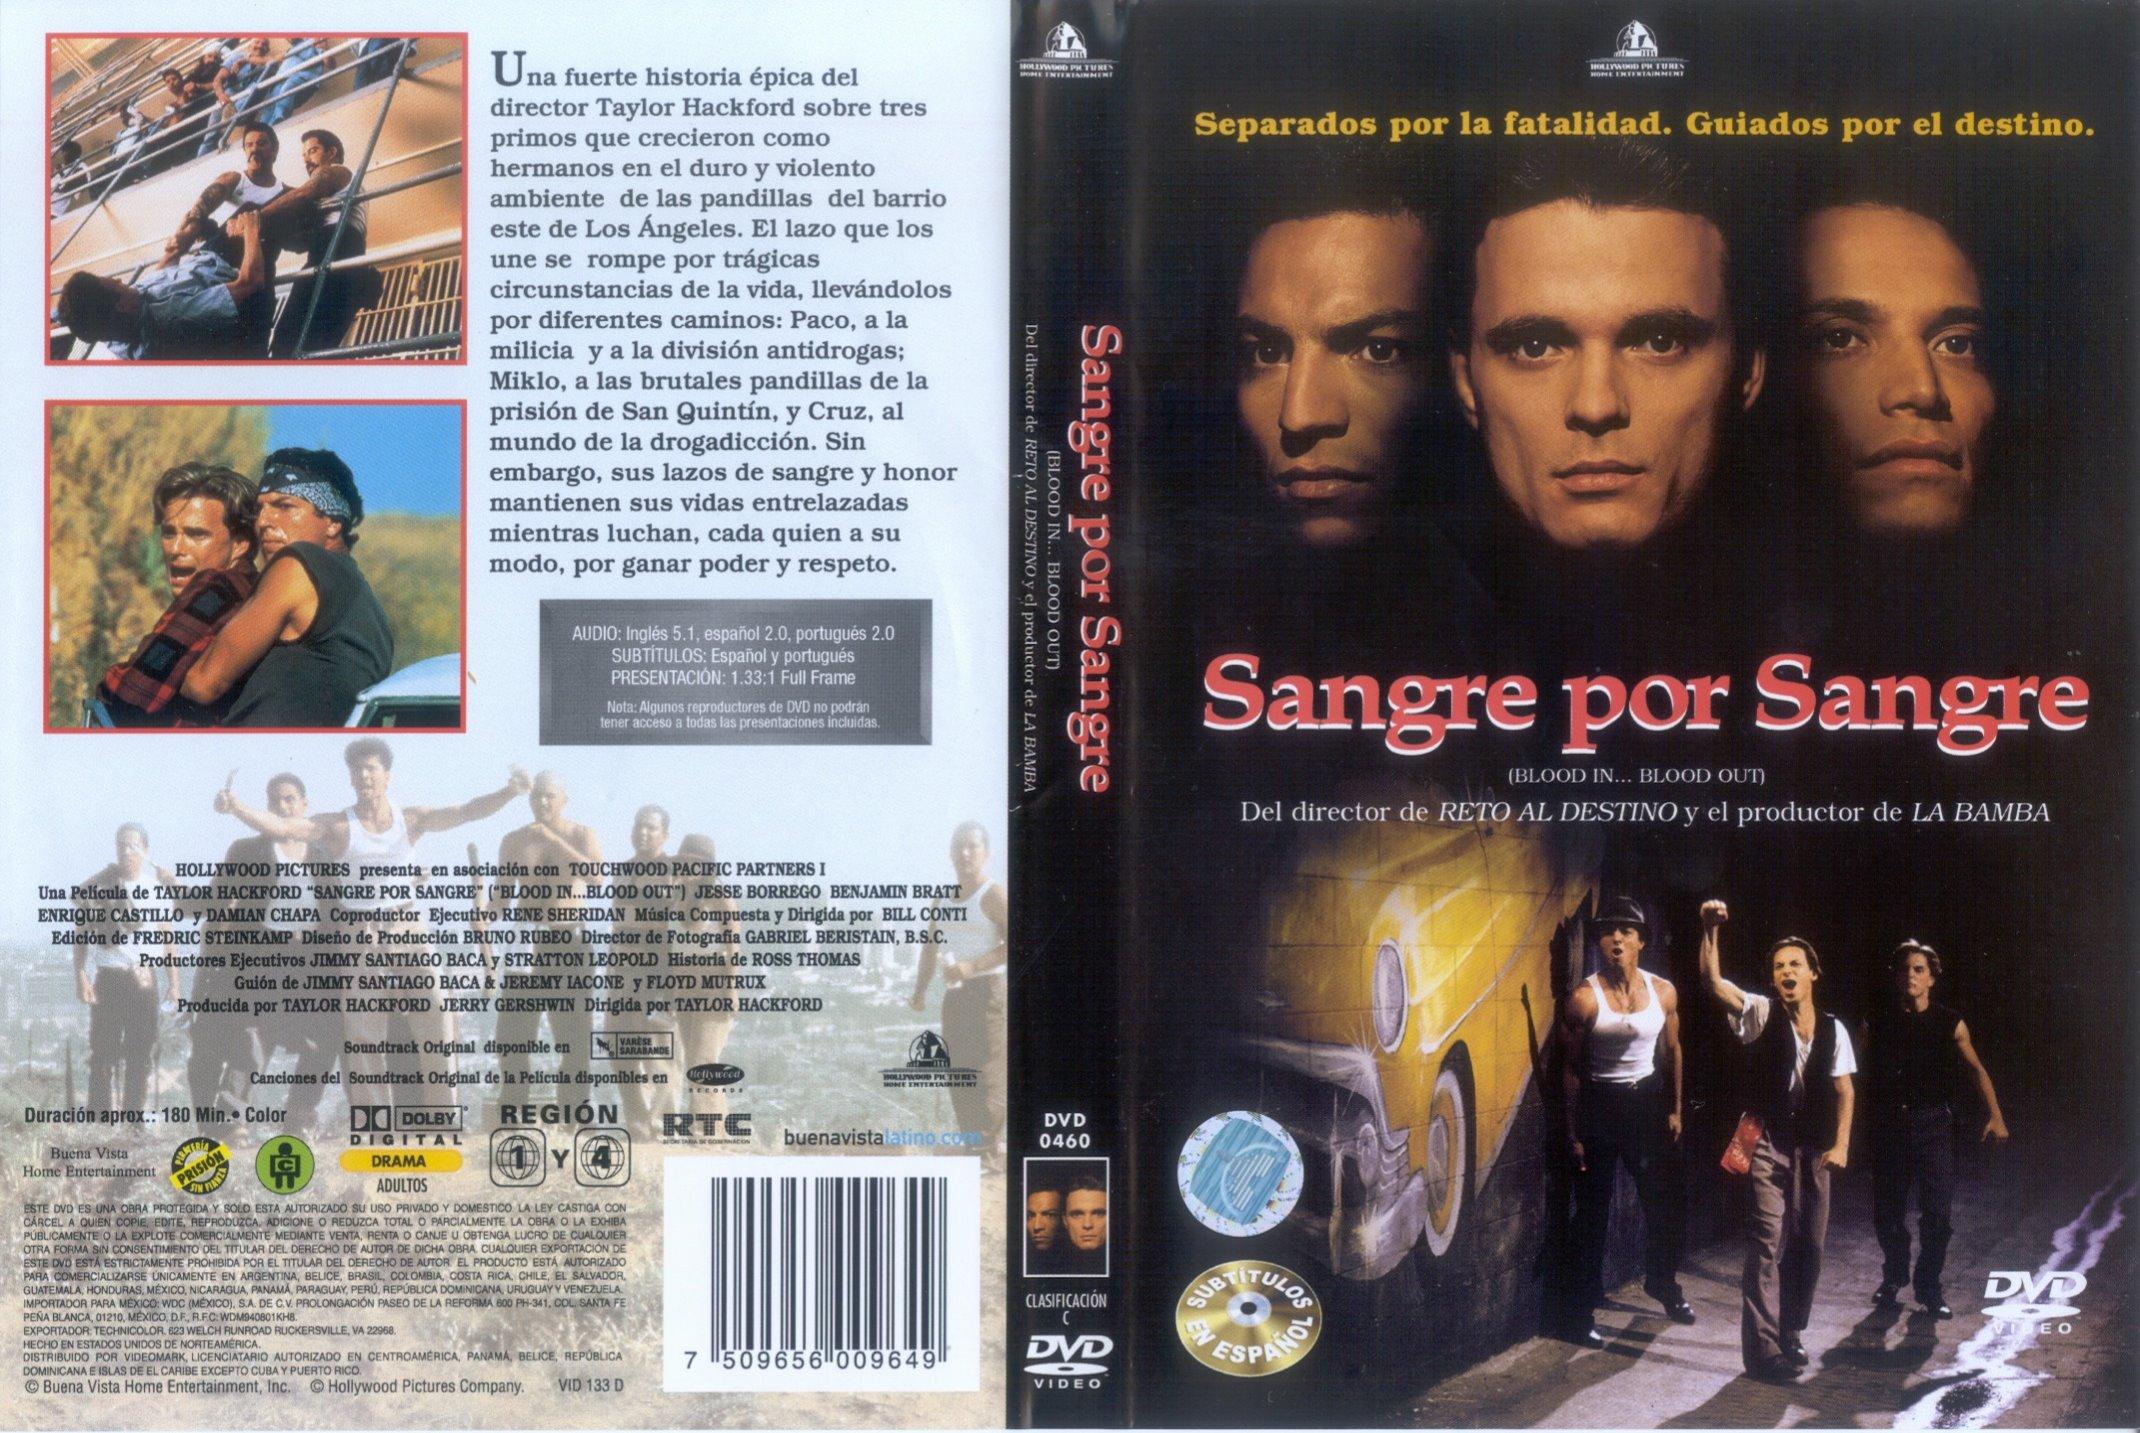 Descargando Con Manu Pelis, DvD Full Latino | Envianos Tus ...